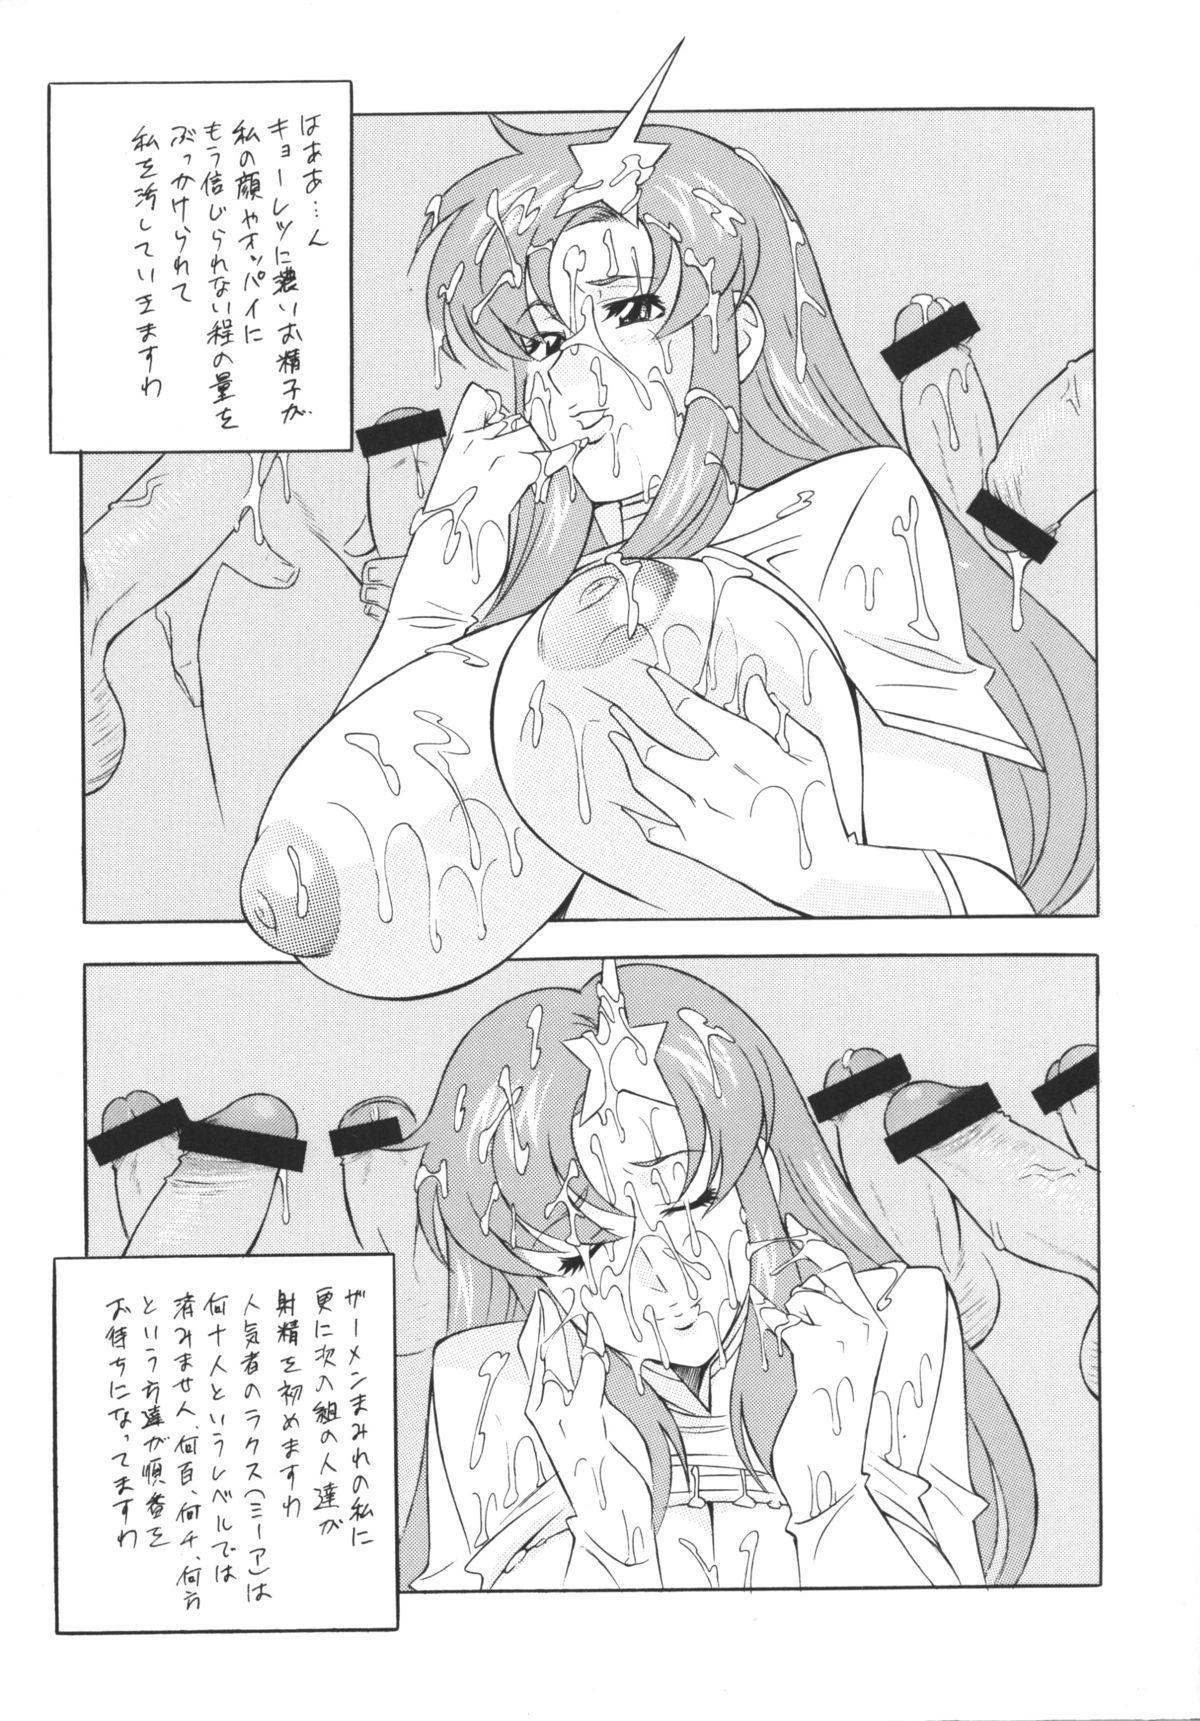 [Okachimentaiko (H-H, Minazuki Akira) Oh! Hentai (Various) 23